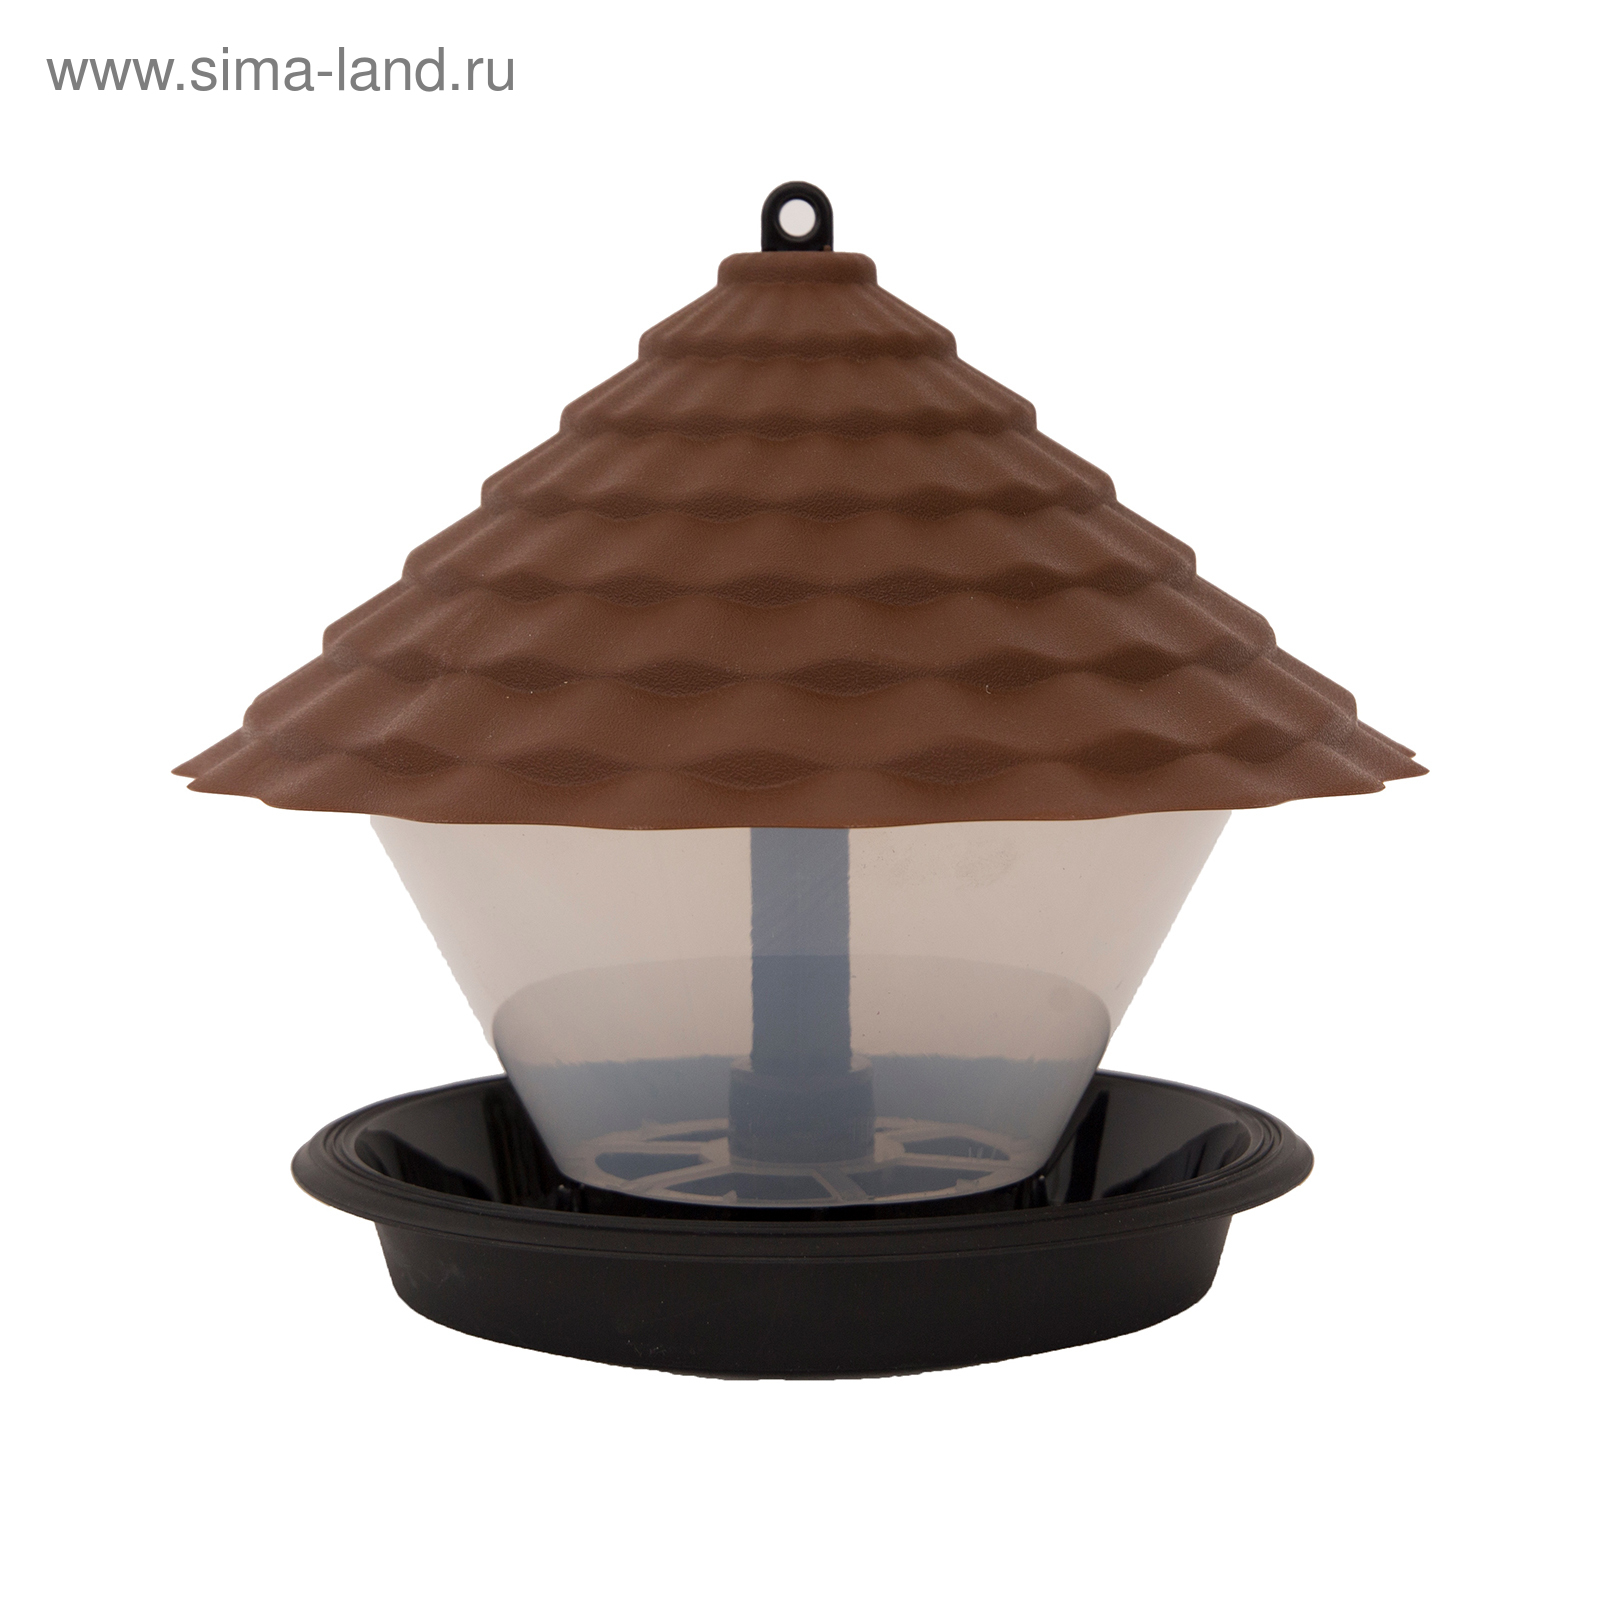 Кормушка для птиц Ornito, коричневая